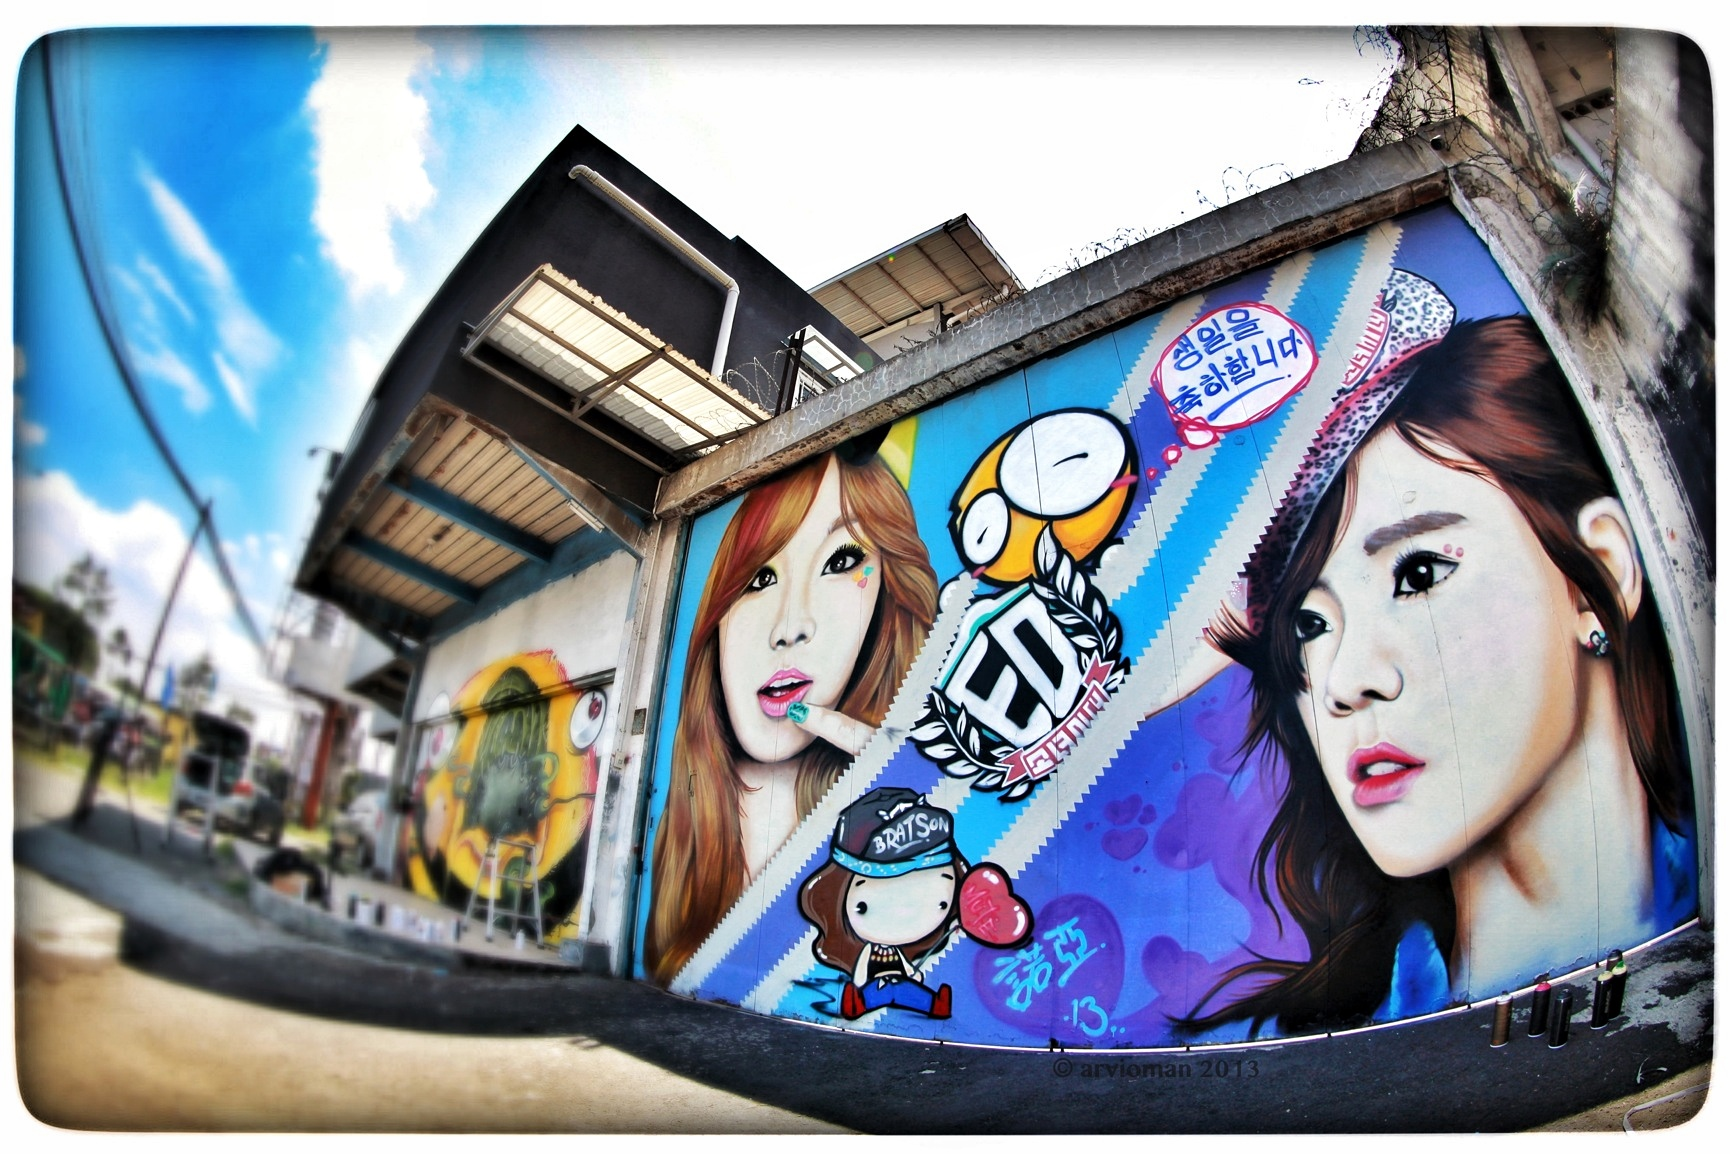 Indonesian Fan Creates a Giant Street Art Display for Taeyeon's Birthday